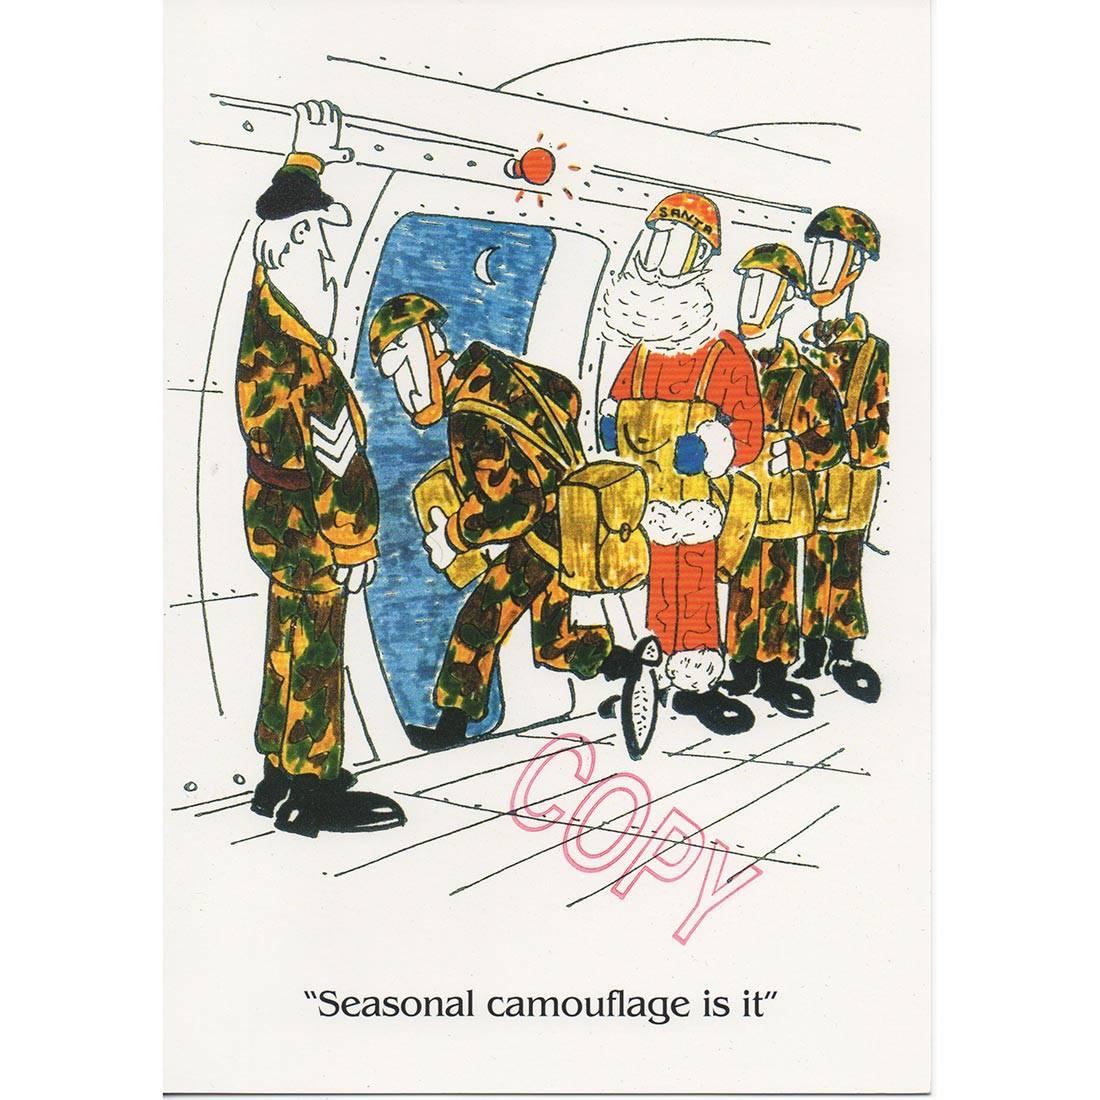 Christmas Card Seasonal Camo Cartoon The Airborne Shop